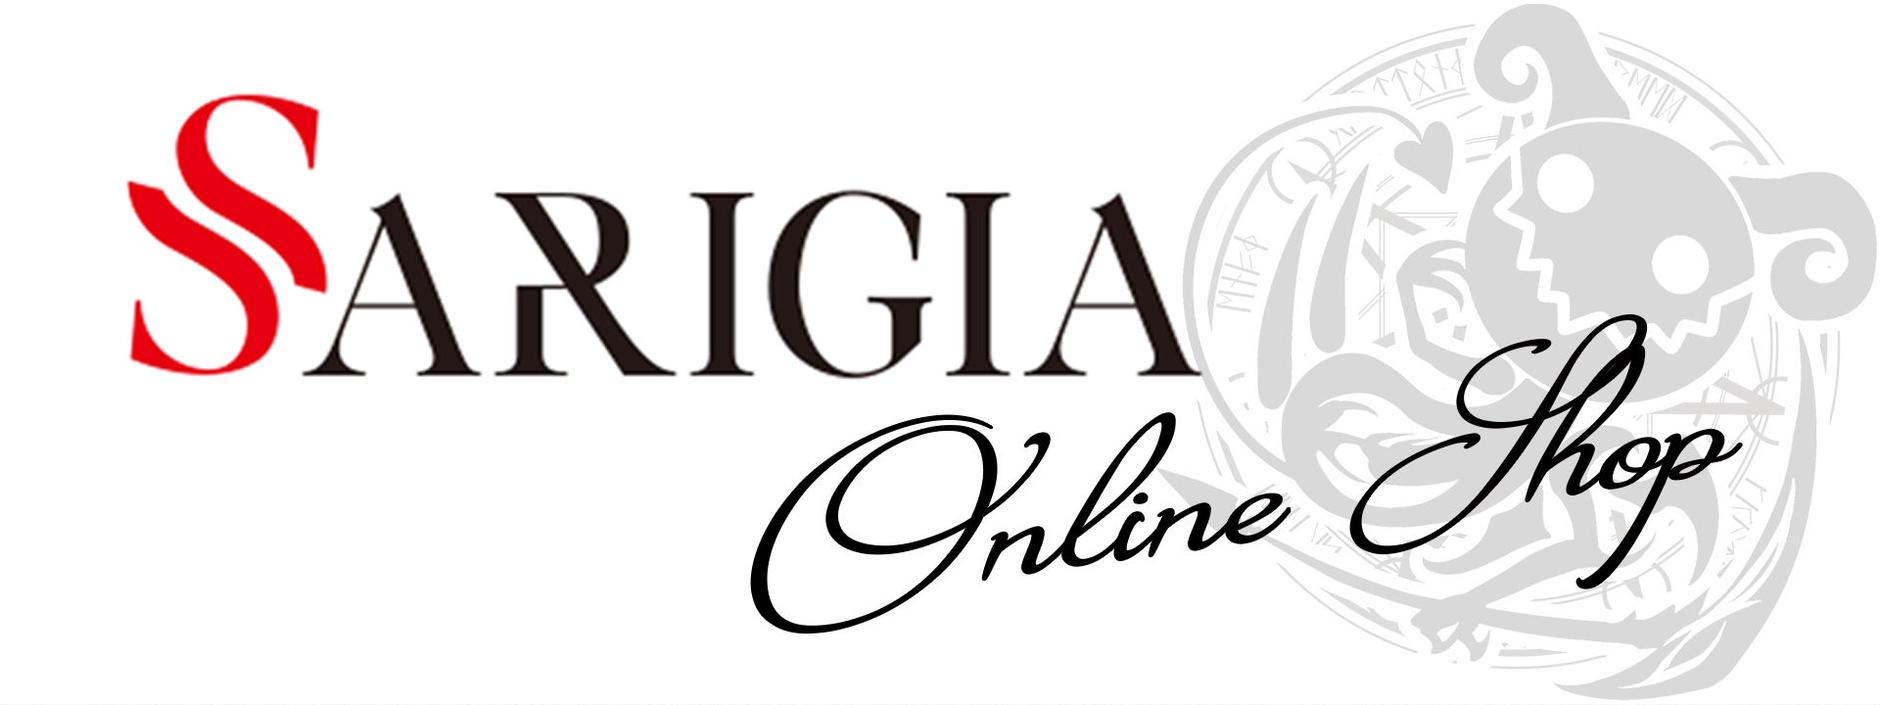 SARIGIA ONLINE SHOP